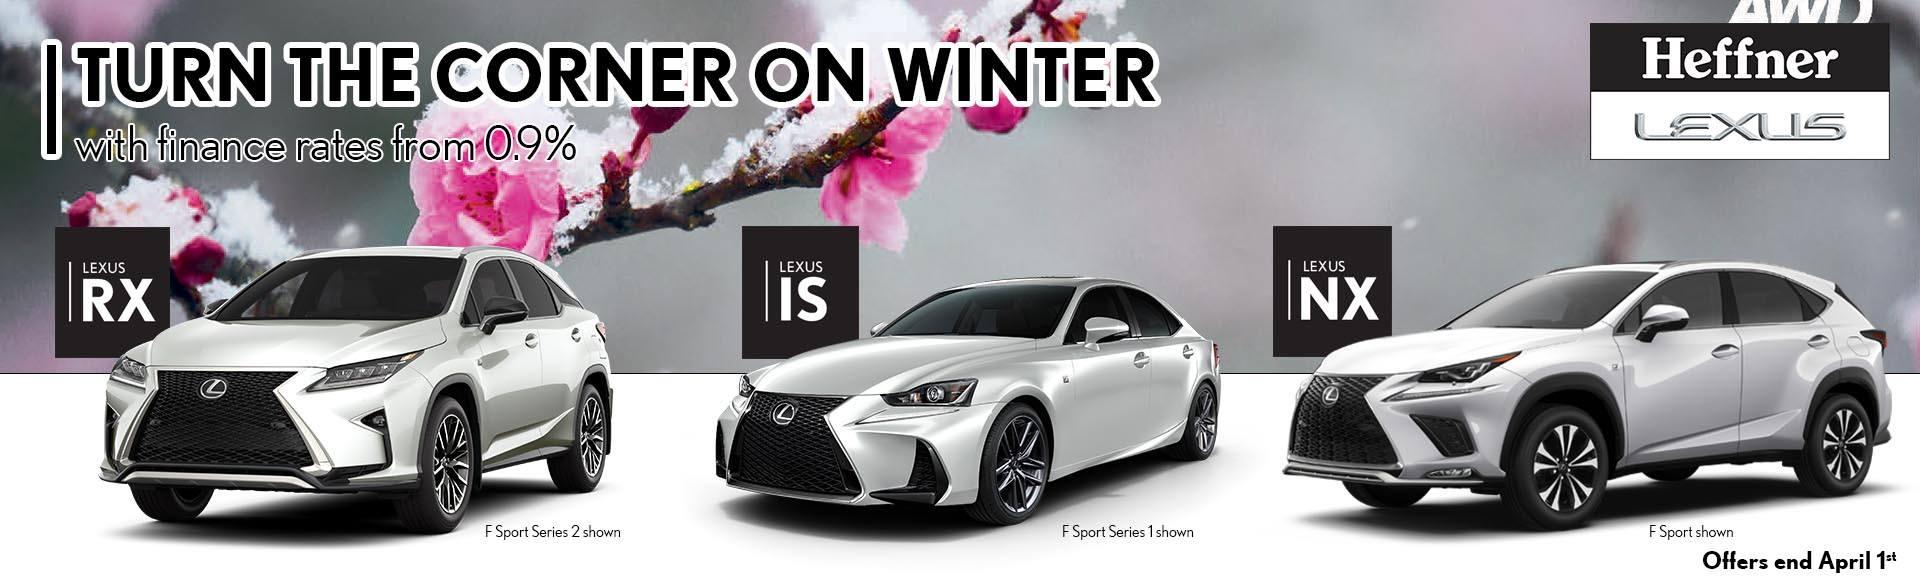 Turn The Corner On Winter_Web